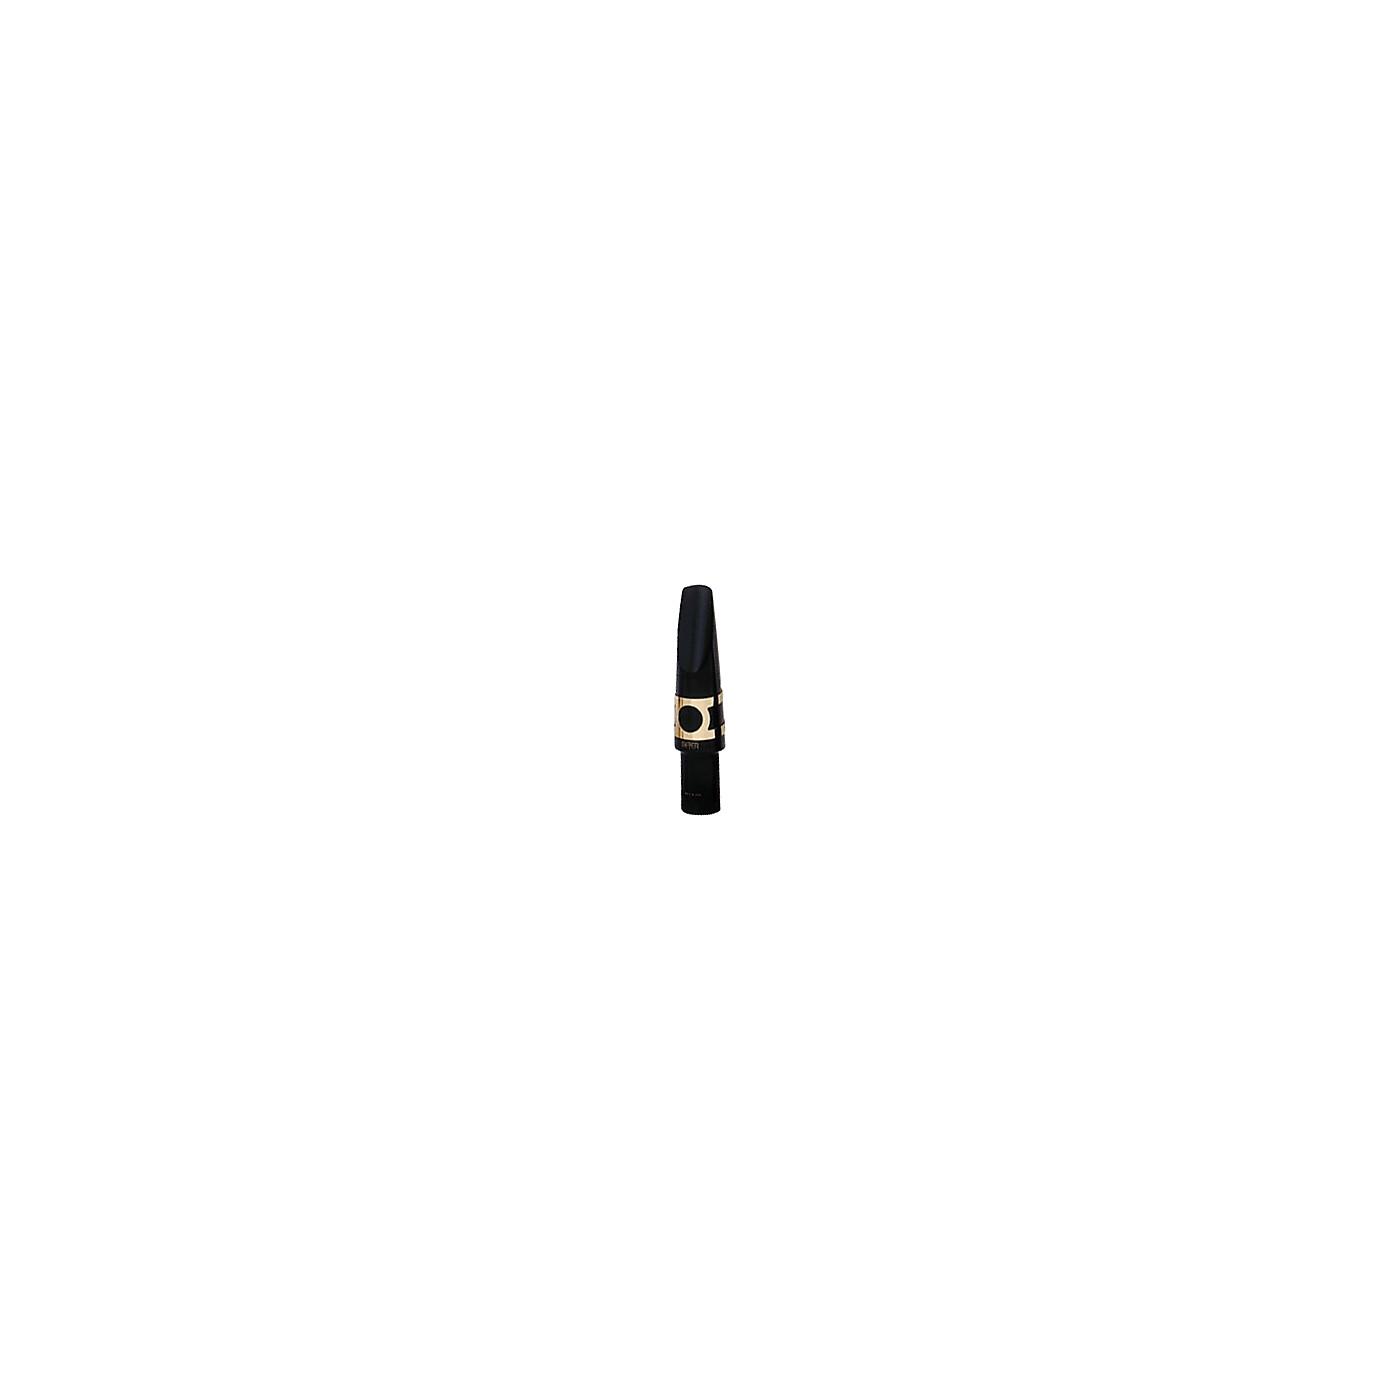 Meteoro Hard Rubber Baritone Saxophone Mouthpiece - 6M thumbnail